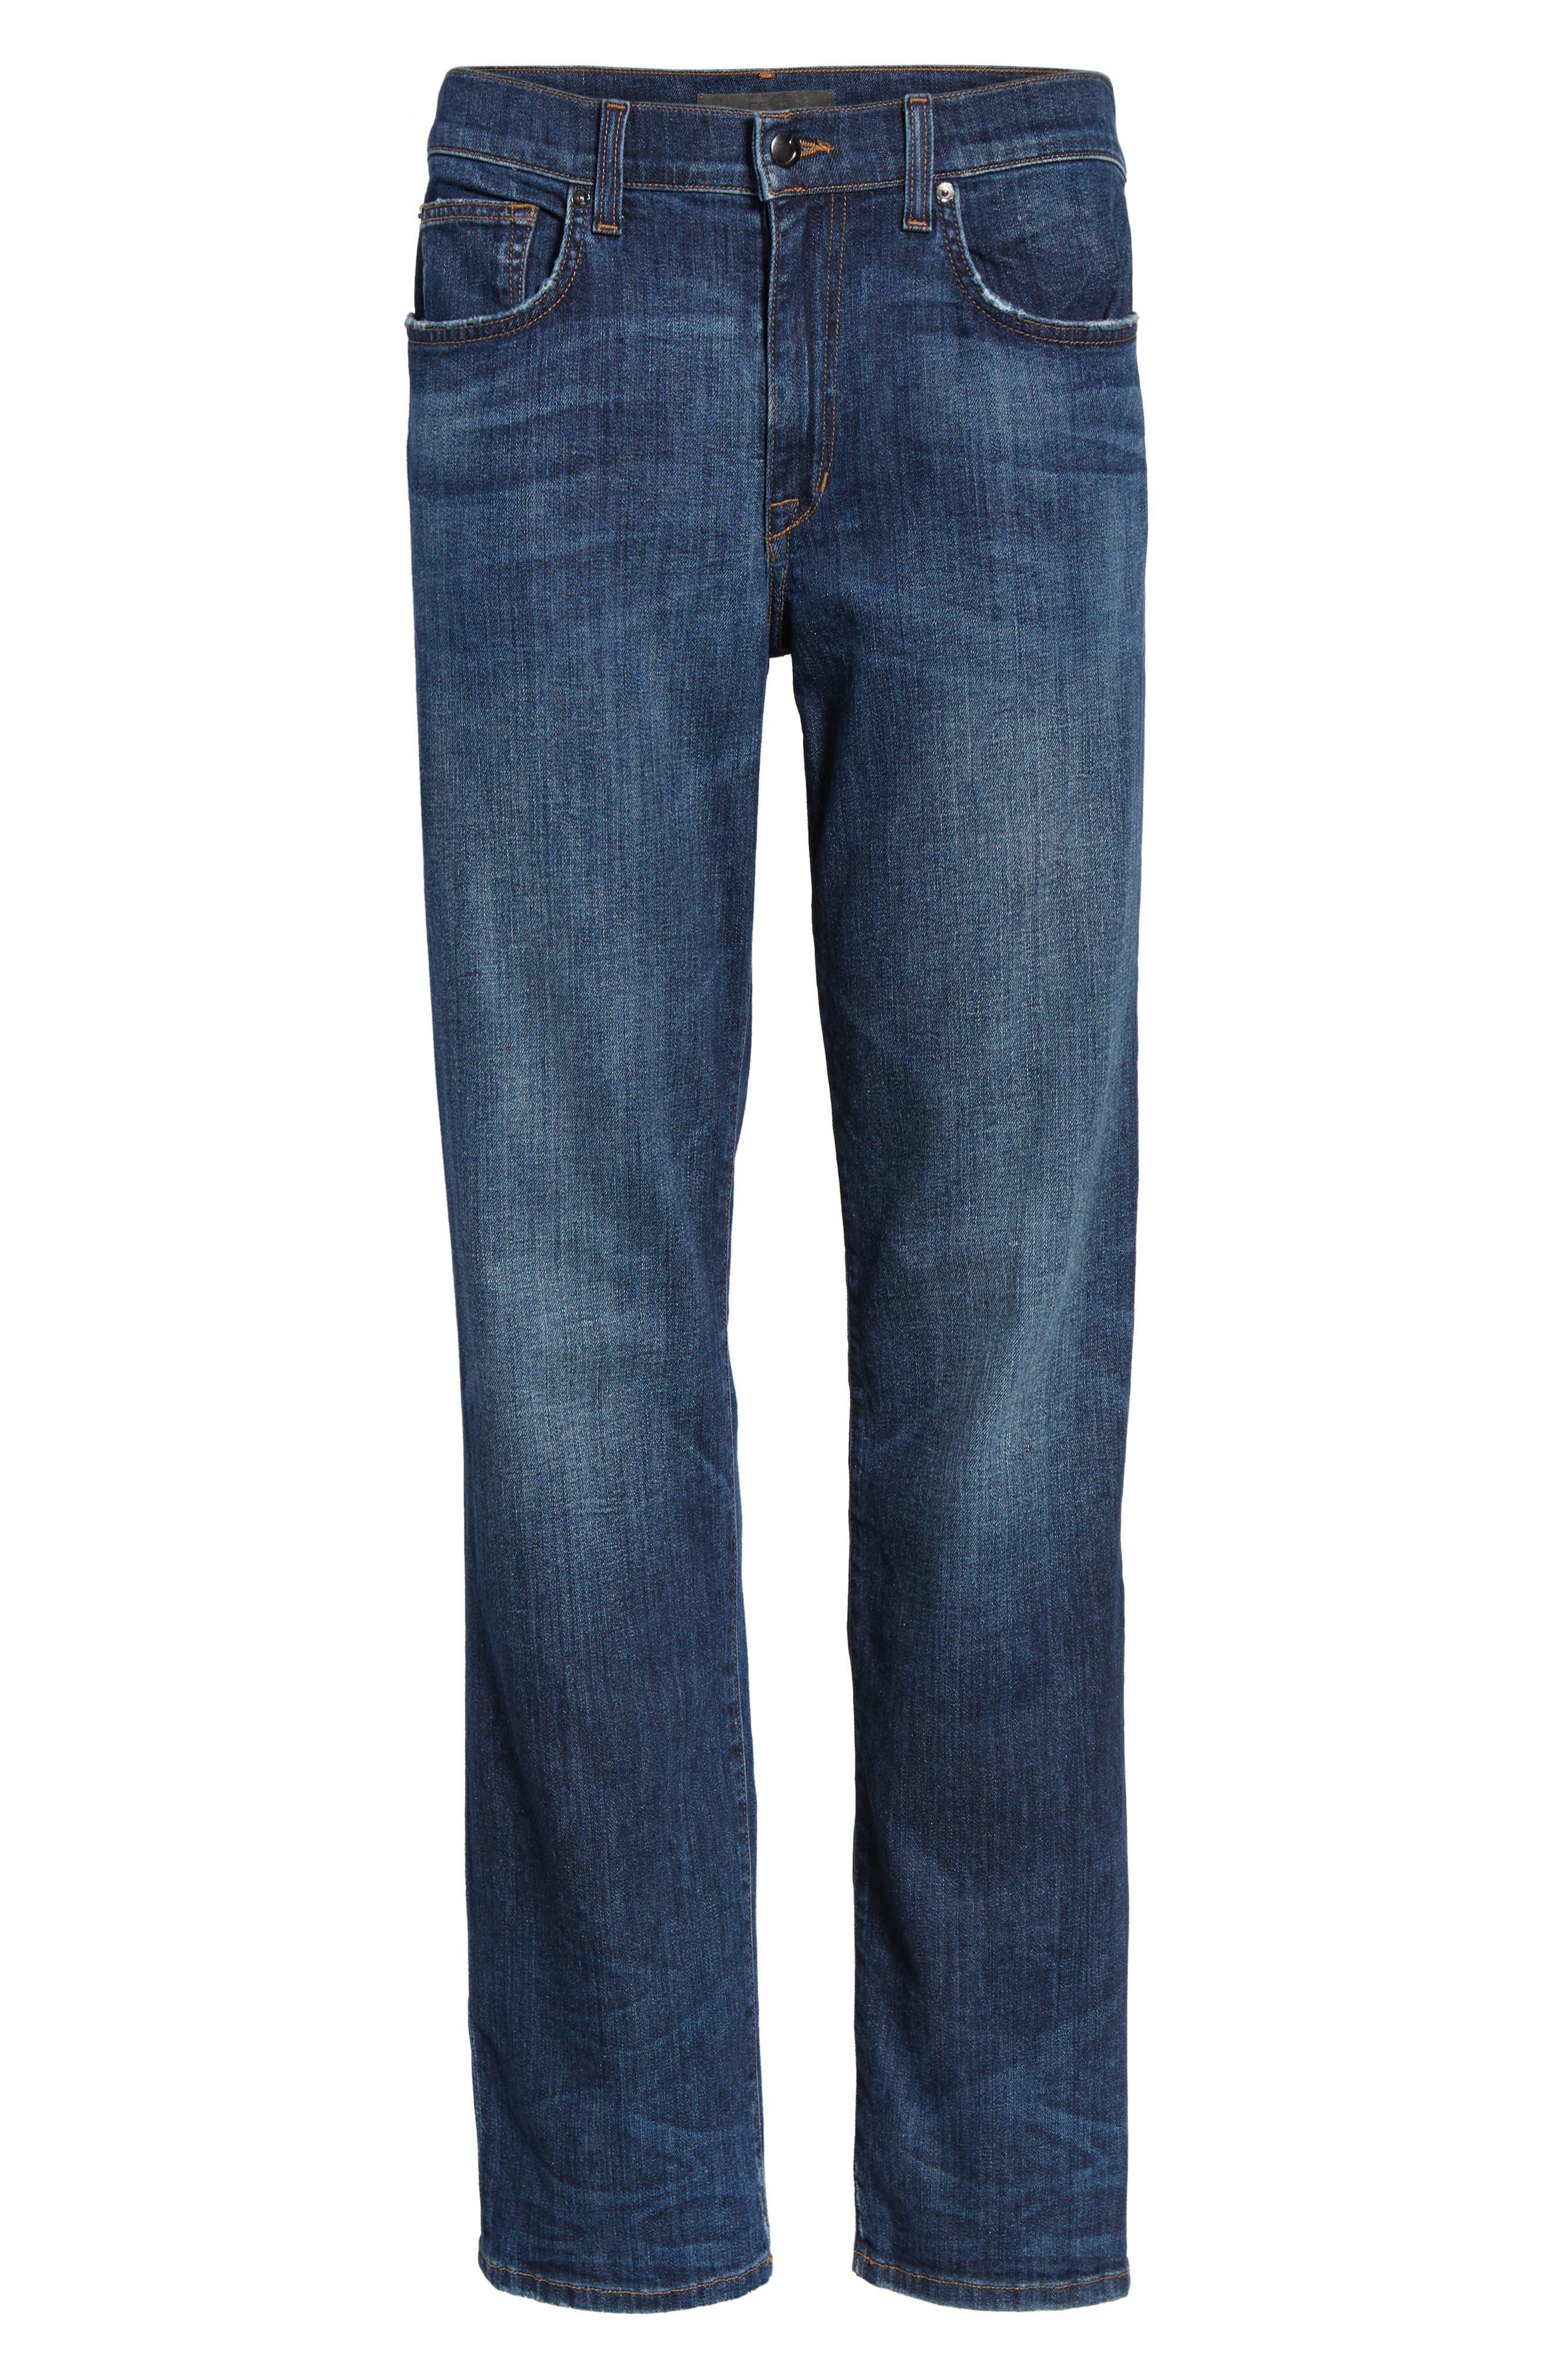 Classic Straight Fit Jeans,                             Alternate thumbnail 6, color,                             VIZZINI